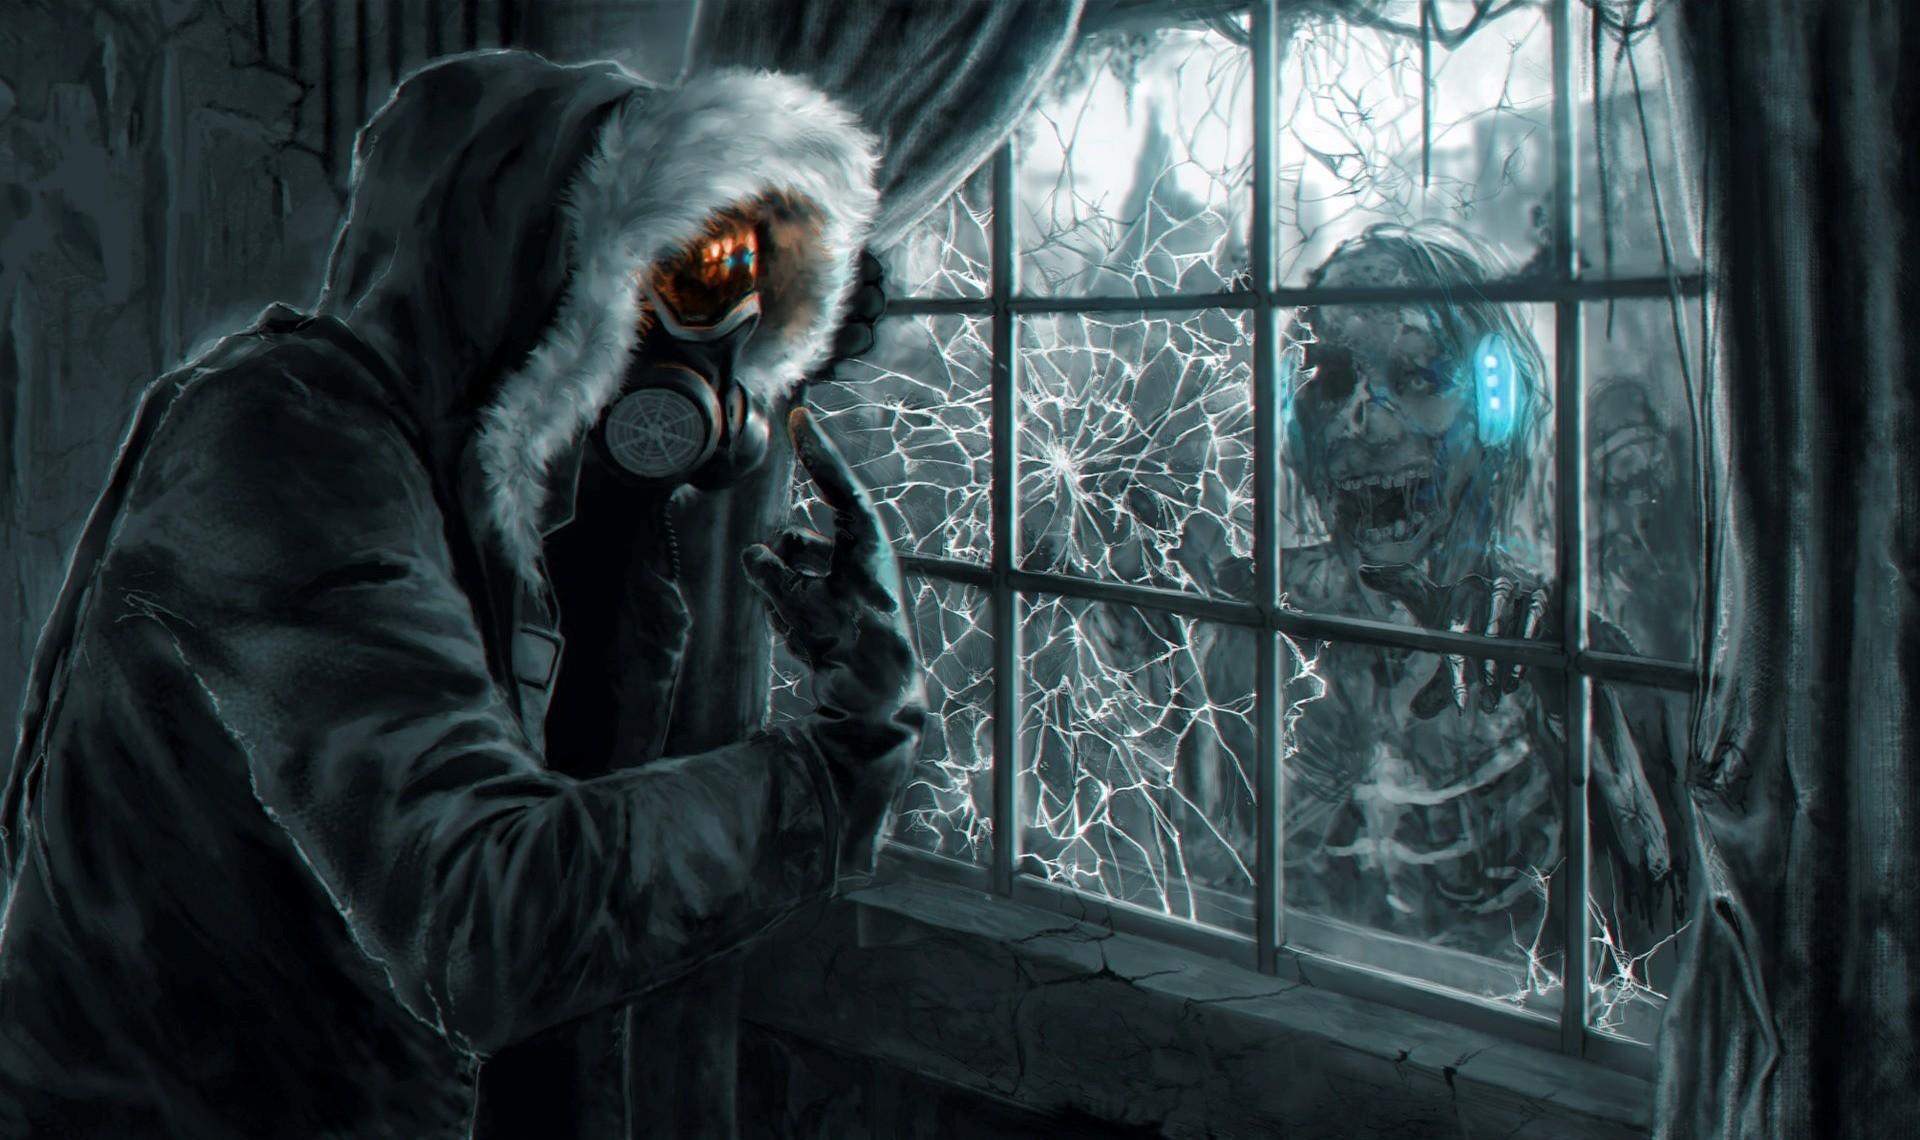 hd zombie apocalypse wallpaper backgrounds hd zombie apocalypse anny .